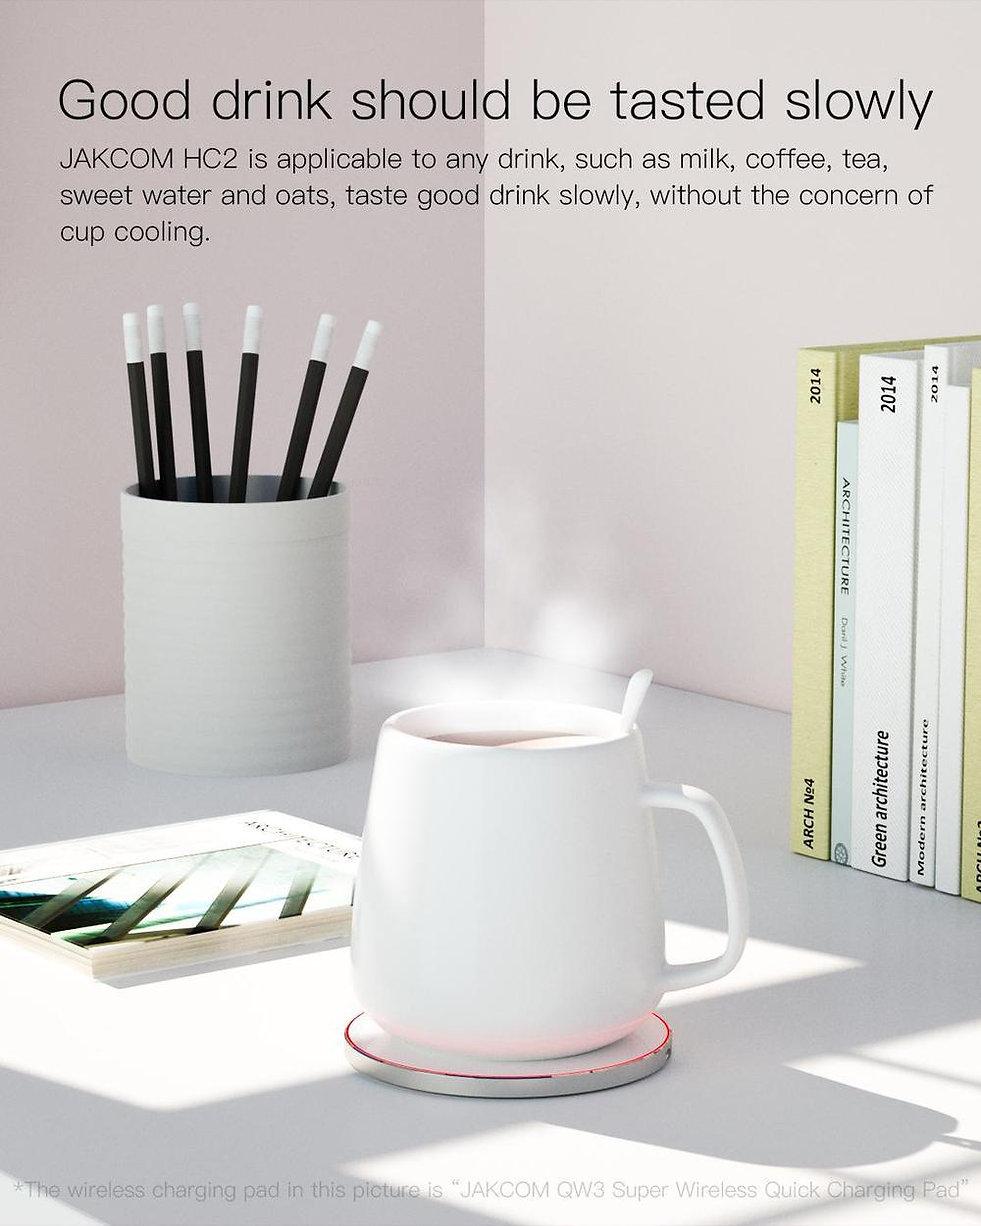 Wireless Heating Cup 5 Shoppiny.jpg